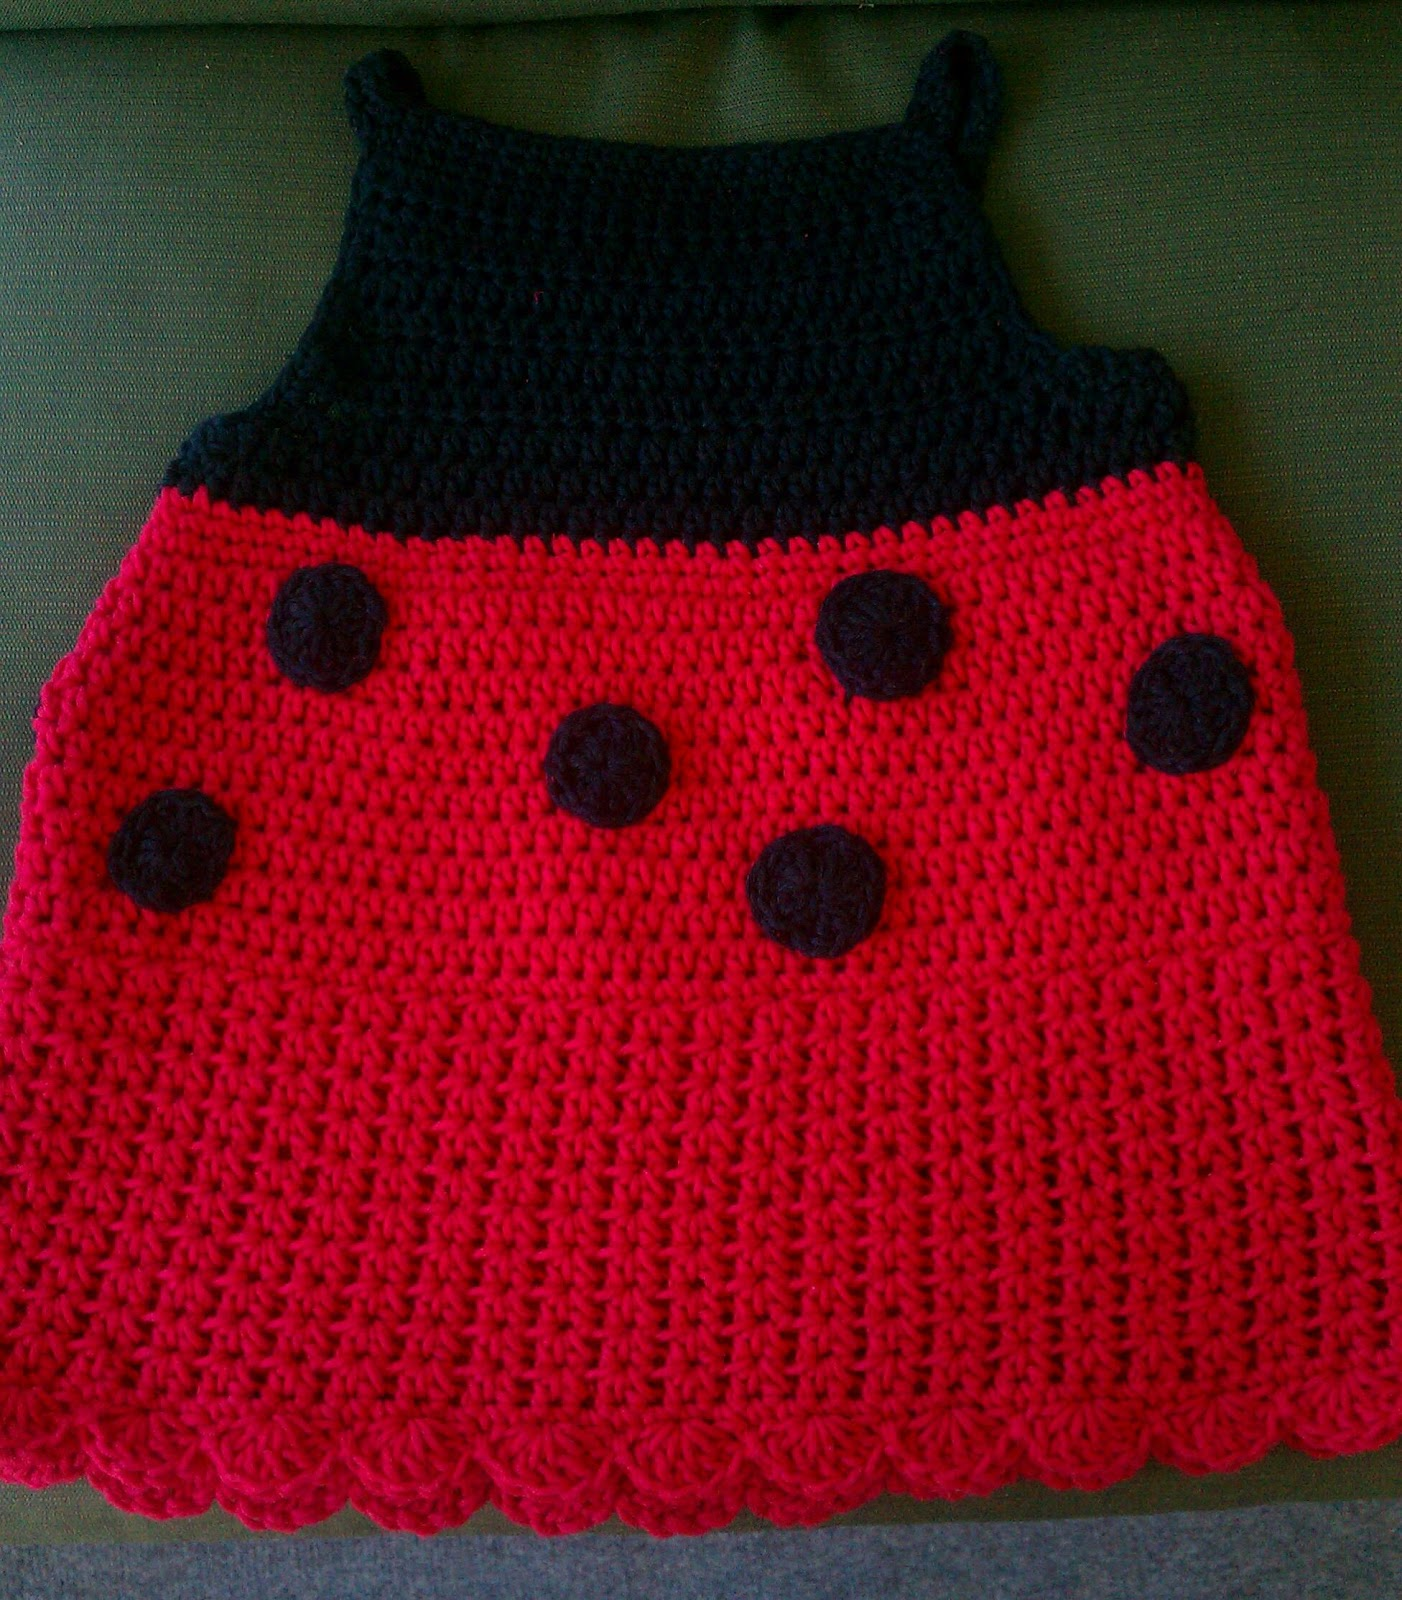 Tw in stitches july 2013 emmys ladybug dress bankloansurffo Choice Image